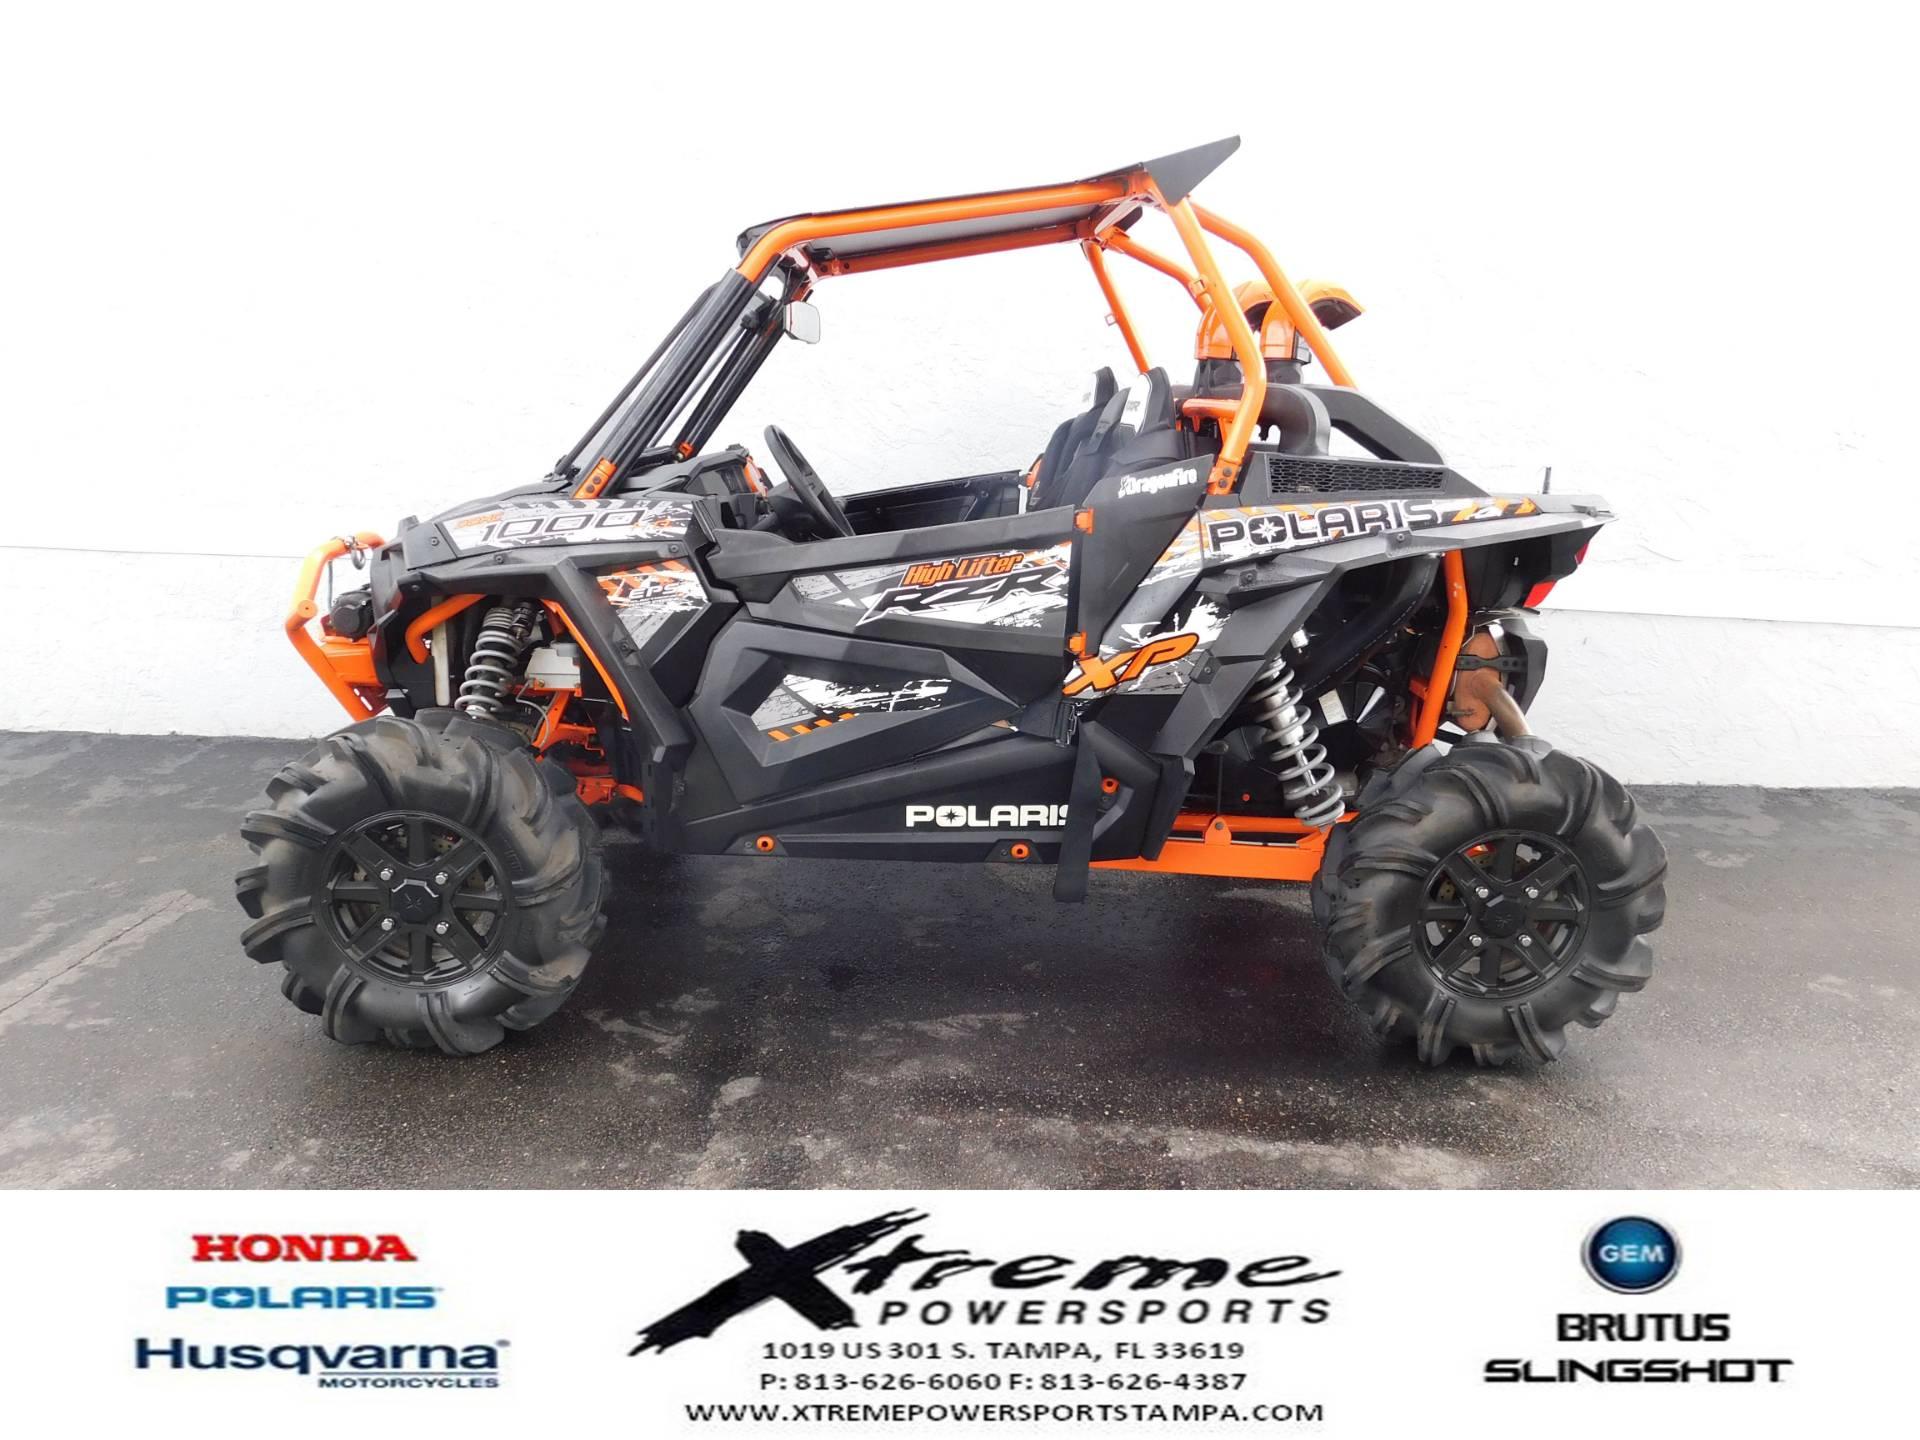 2015 Polaris RZR XP 1000 EPS High Lifter Edition for sale 48880